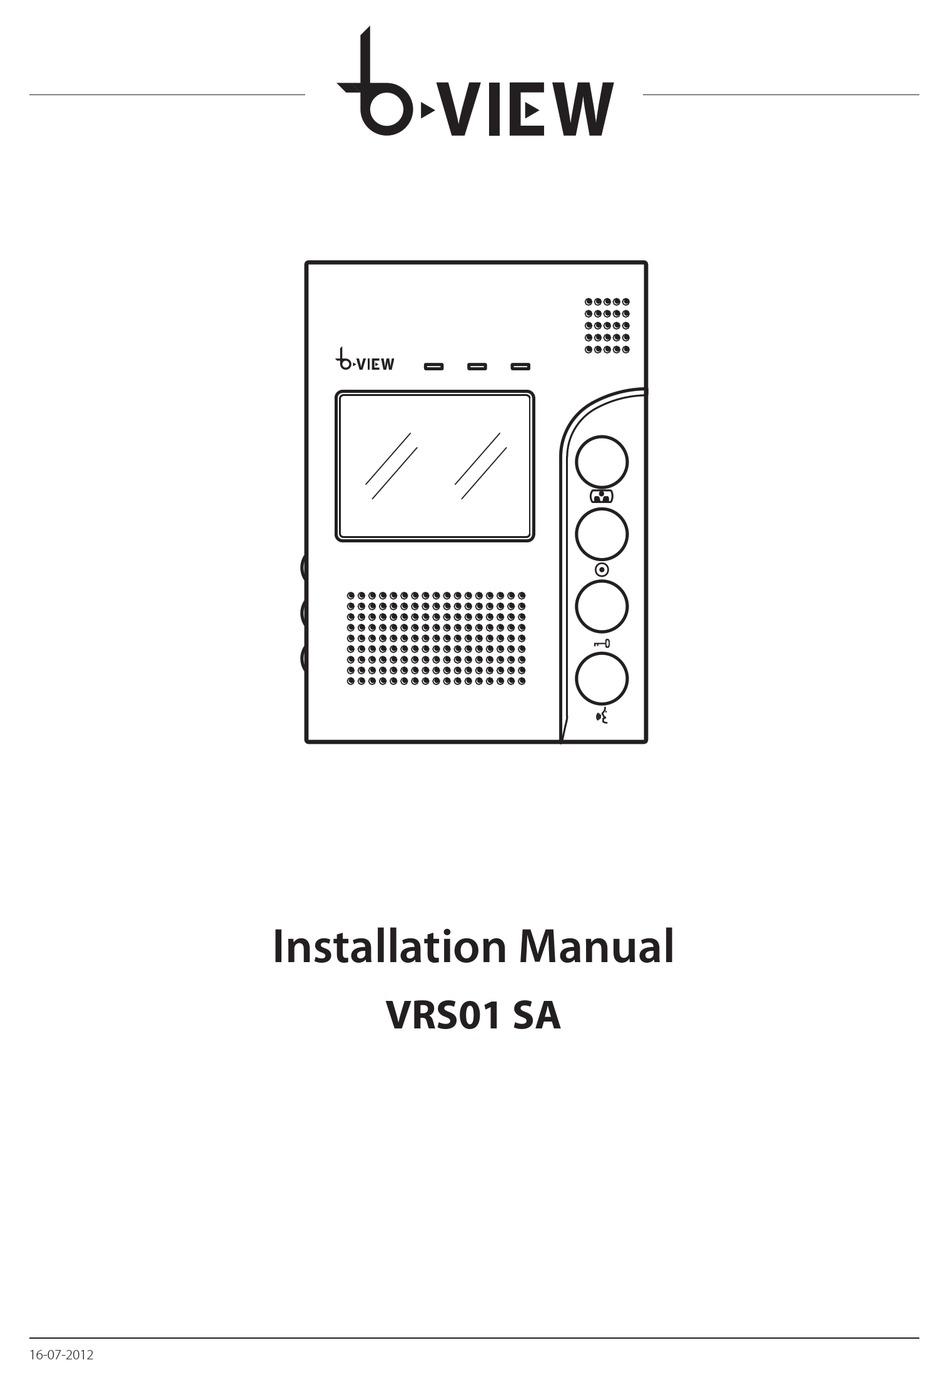 BPT B-VIEW VRS01 SA INSTALLATION MANUAL Pdf Download